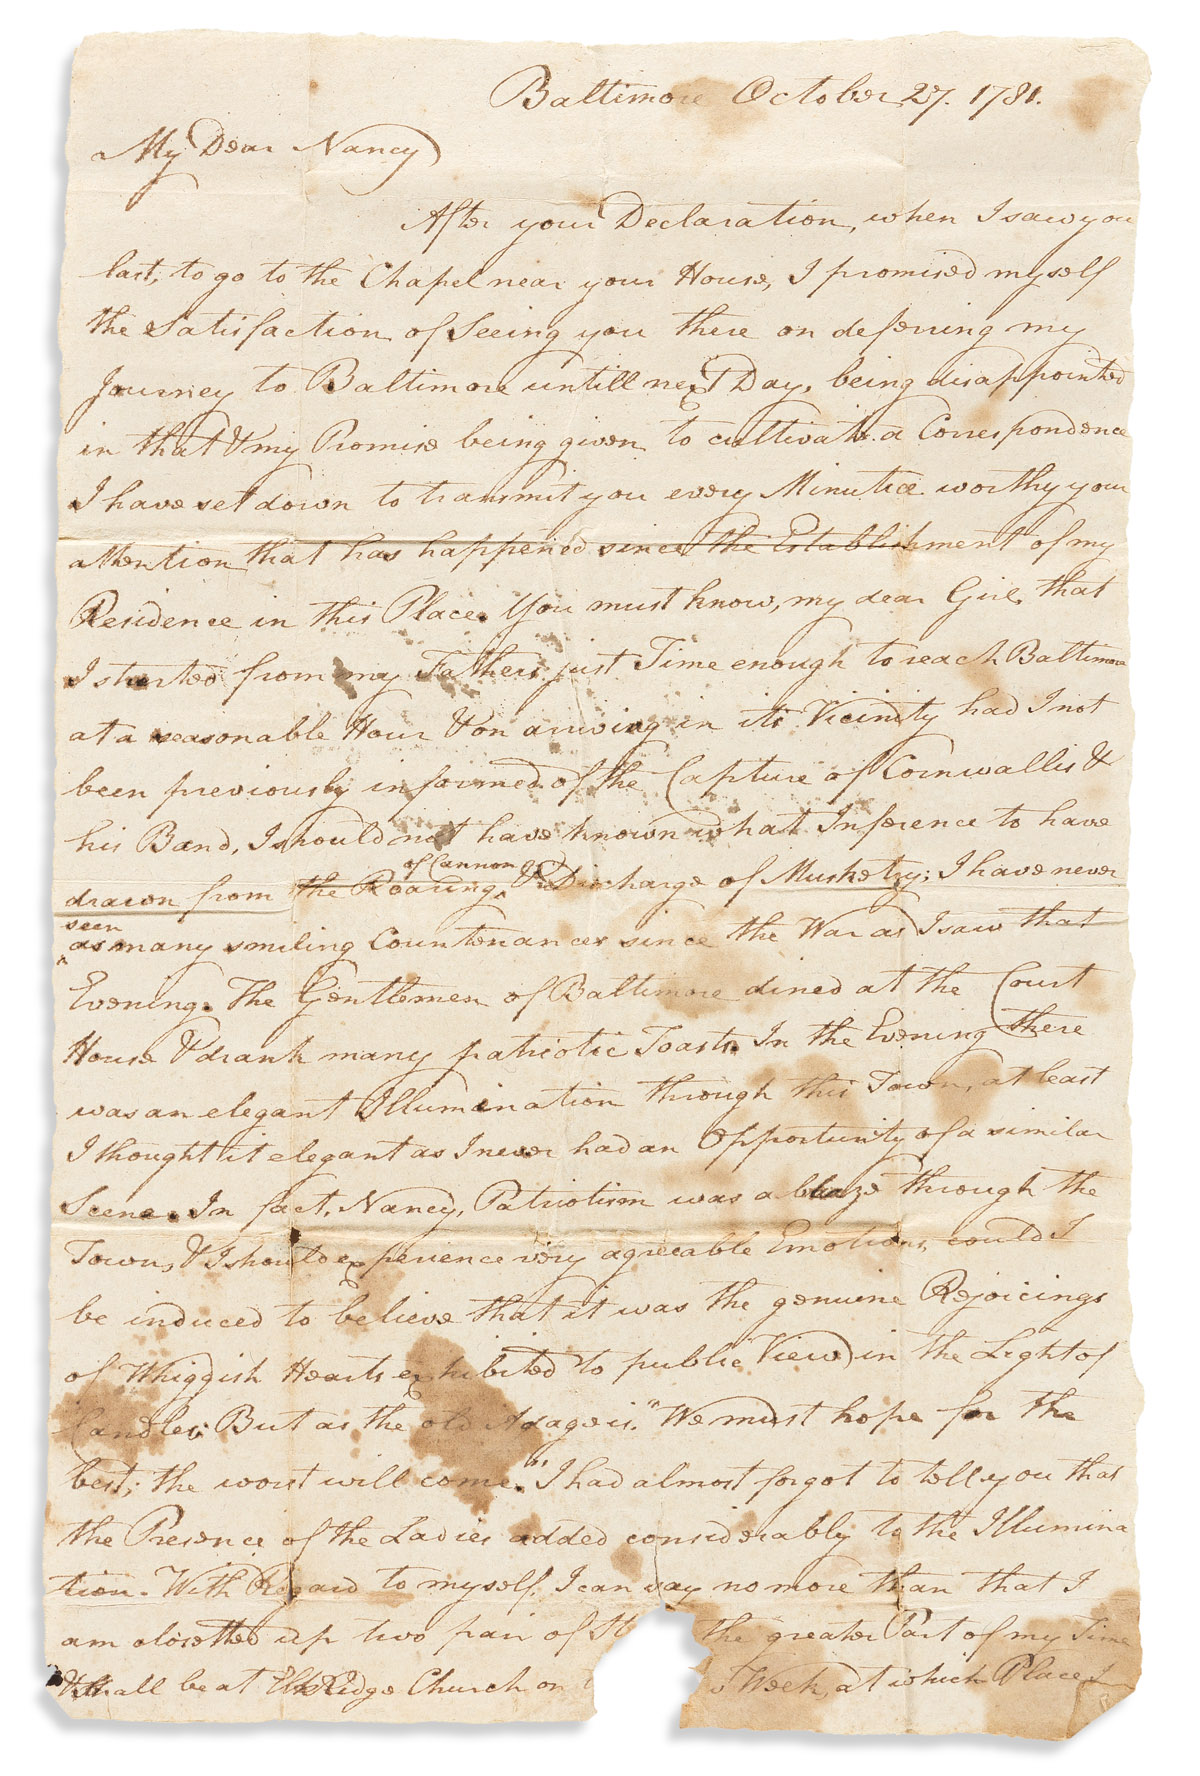 (AMERICAN REVOLUTION--1781.) H. Ridgely, Jr. Letter describing the festivities in Baltimore after the Yorktown surrender.